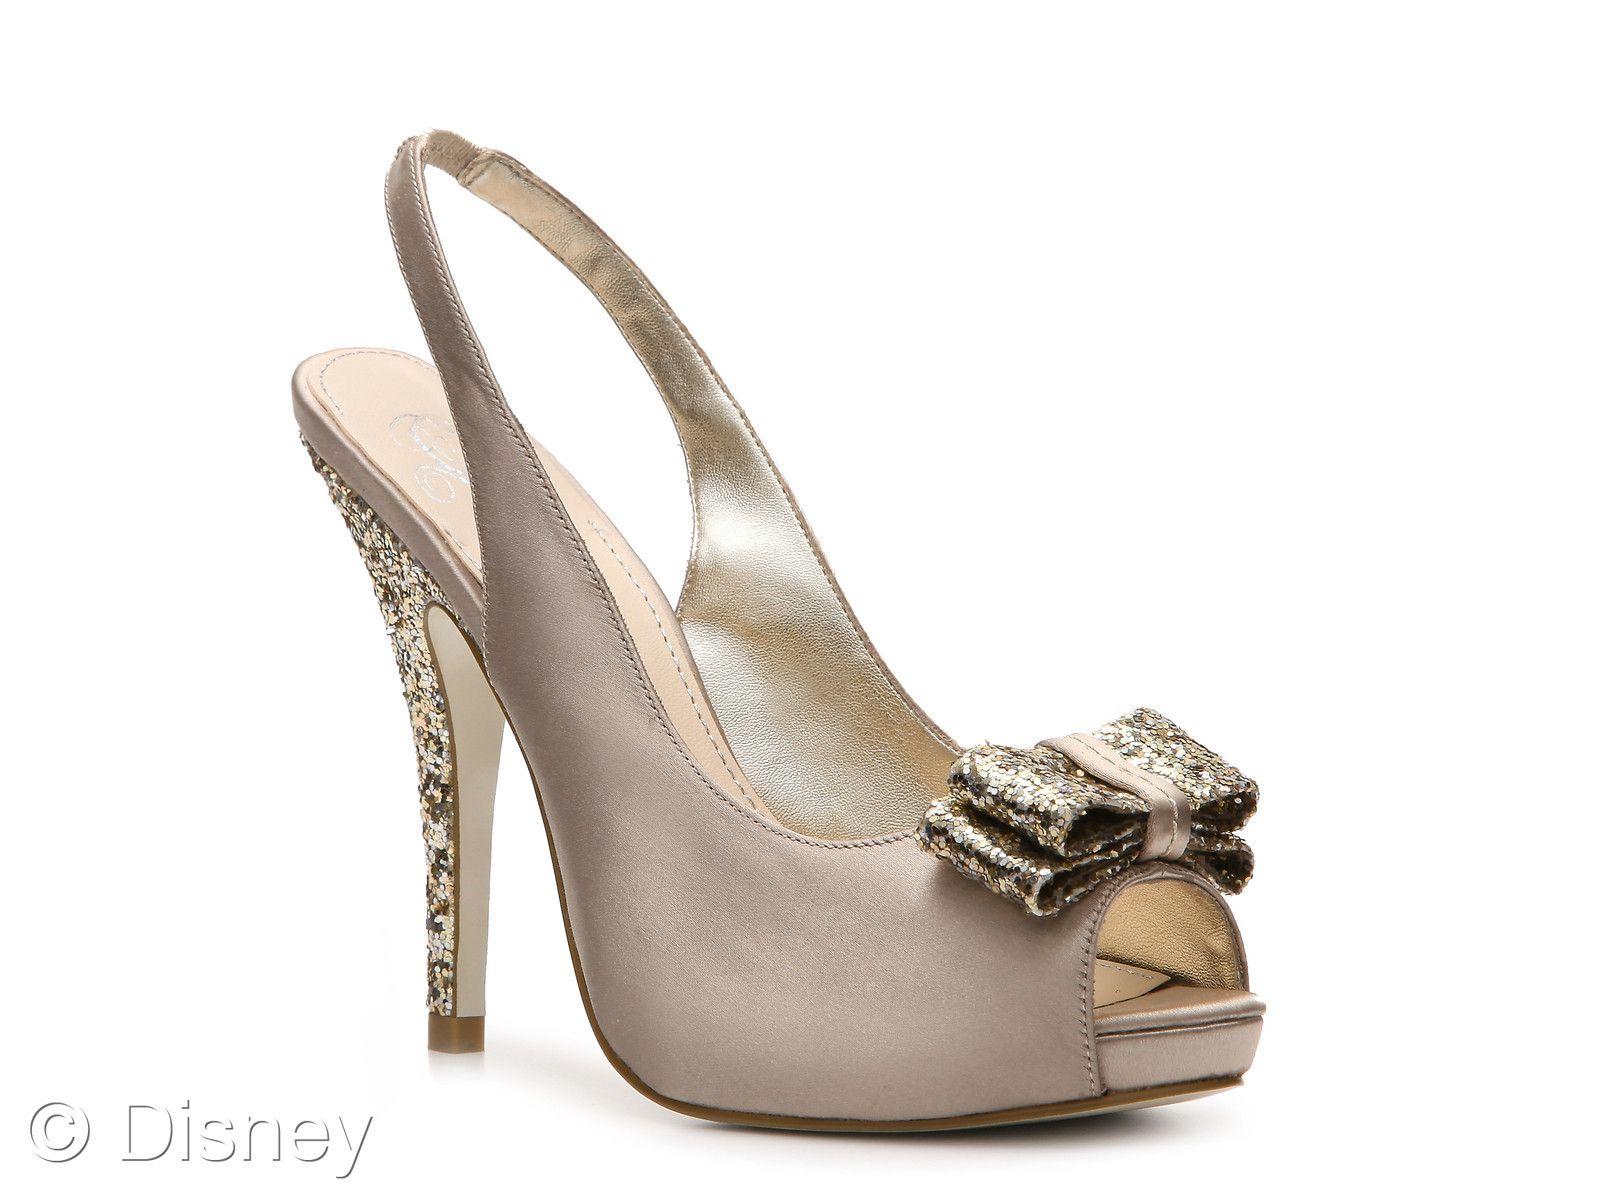 Cinderella Dsw Shoe 5 Jpeg 1600 1200 Shoes Women Shoes Fashion Shoes